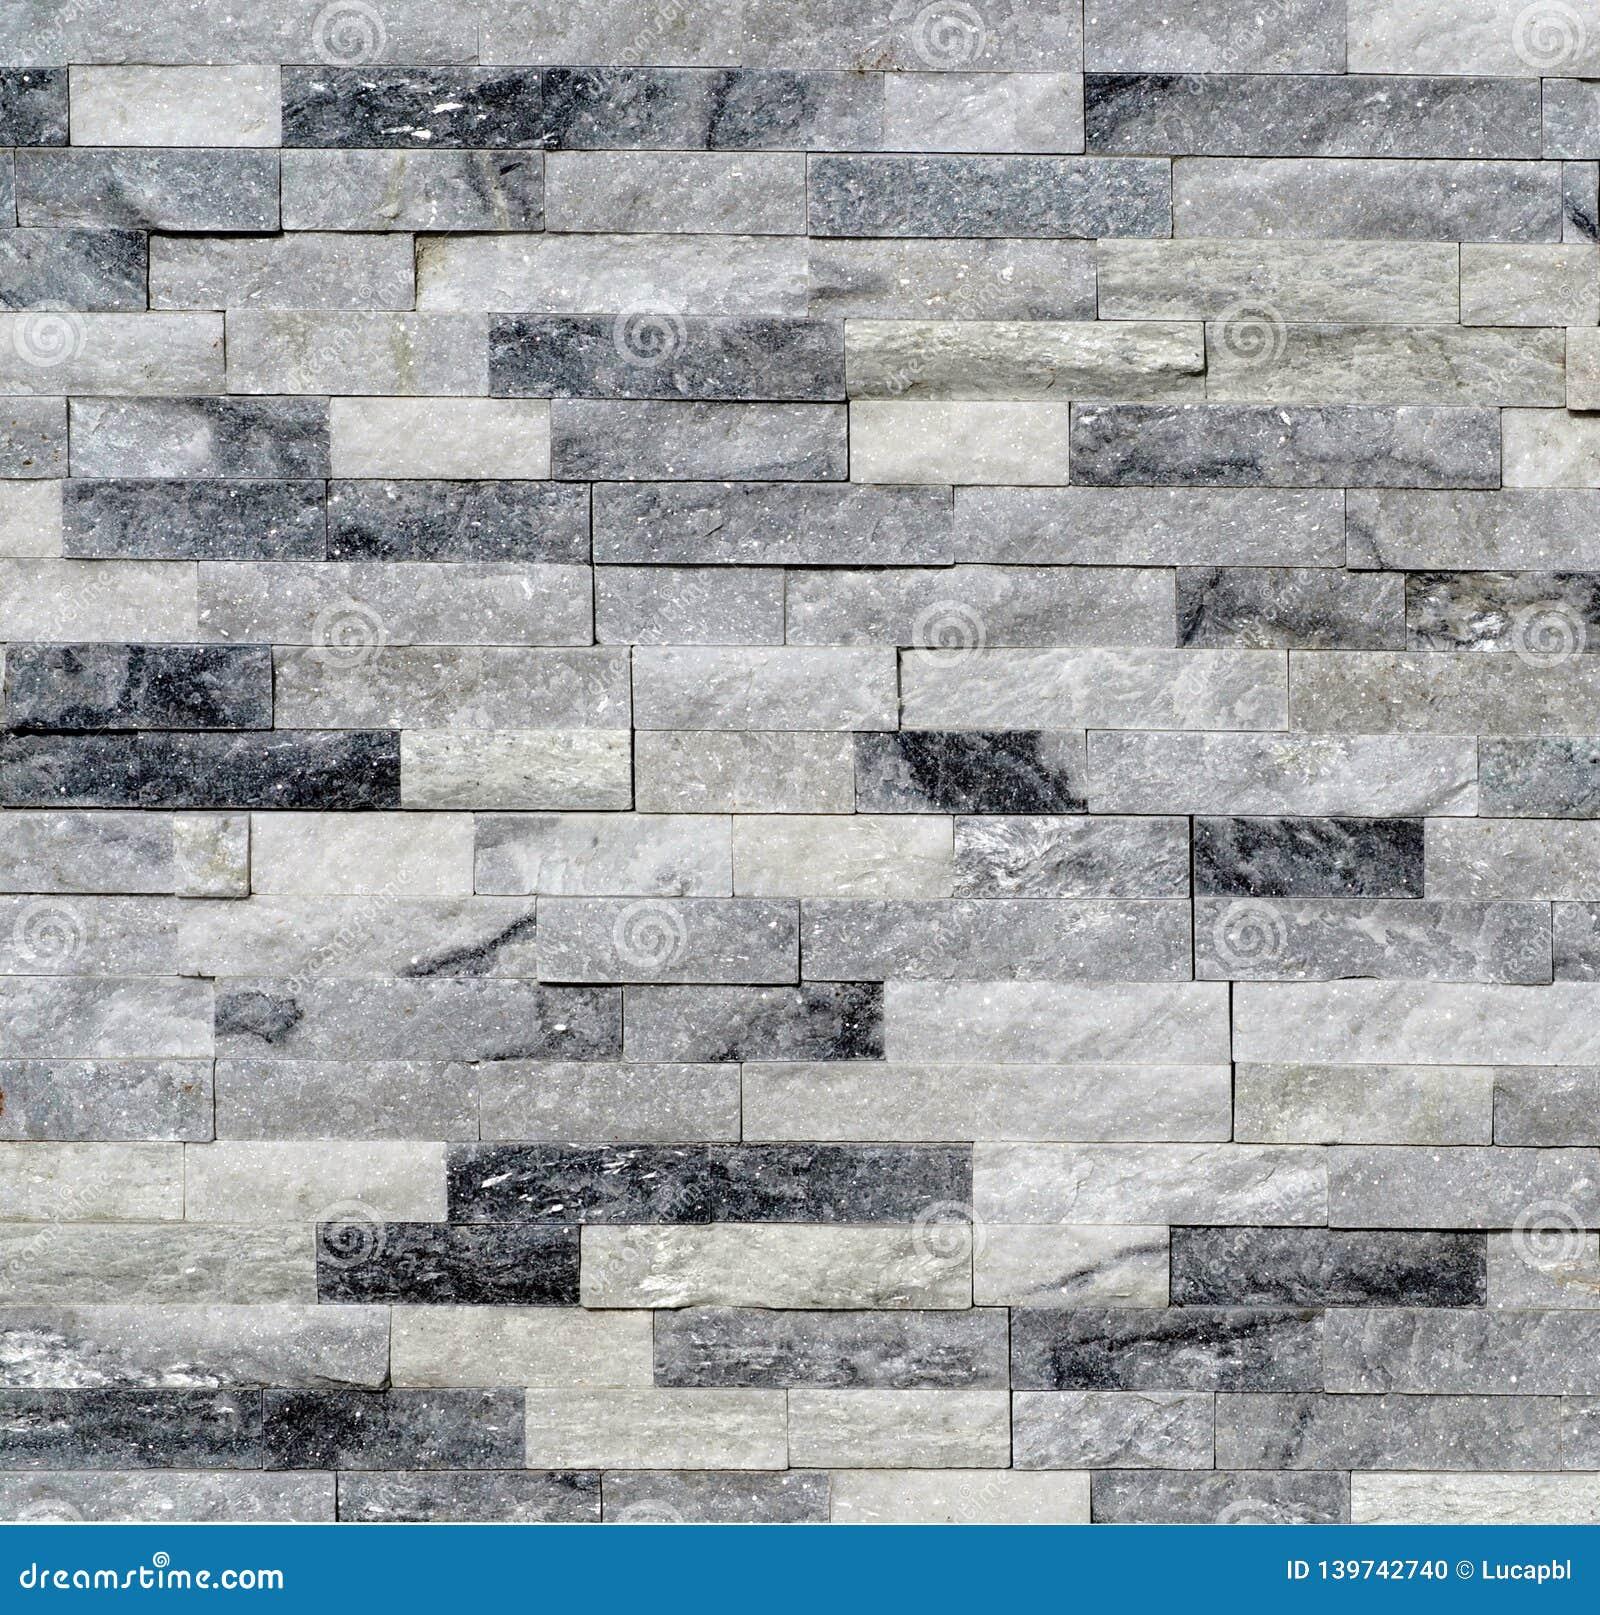 Stone wall cladding made of white and gray quartzite bricks